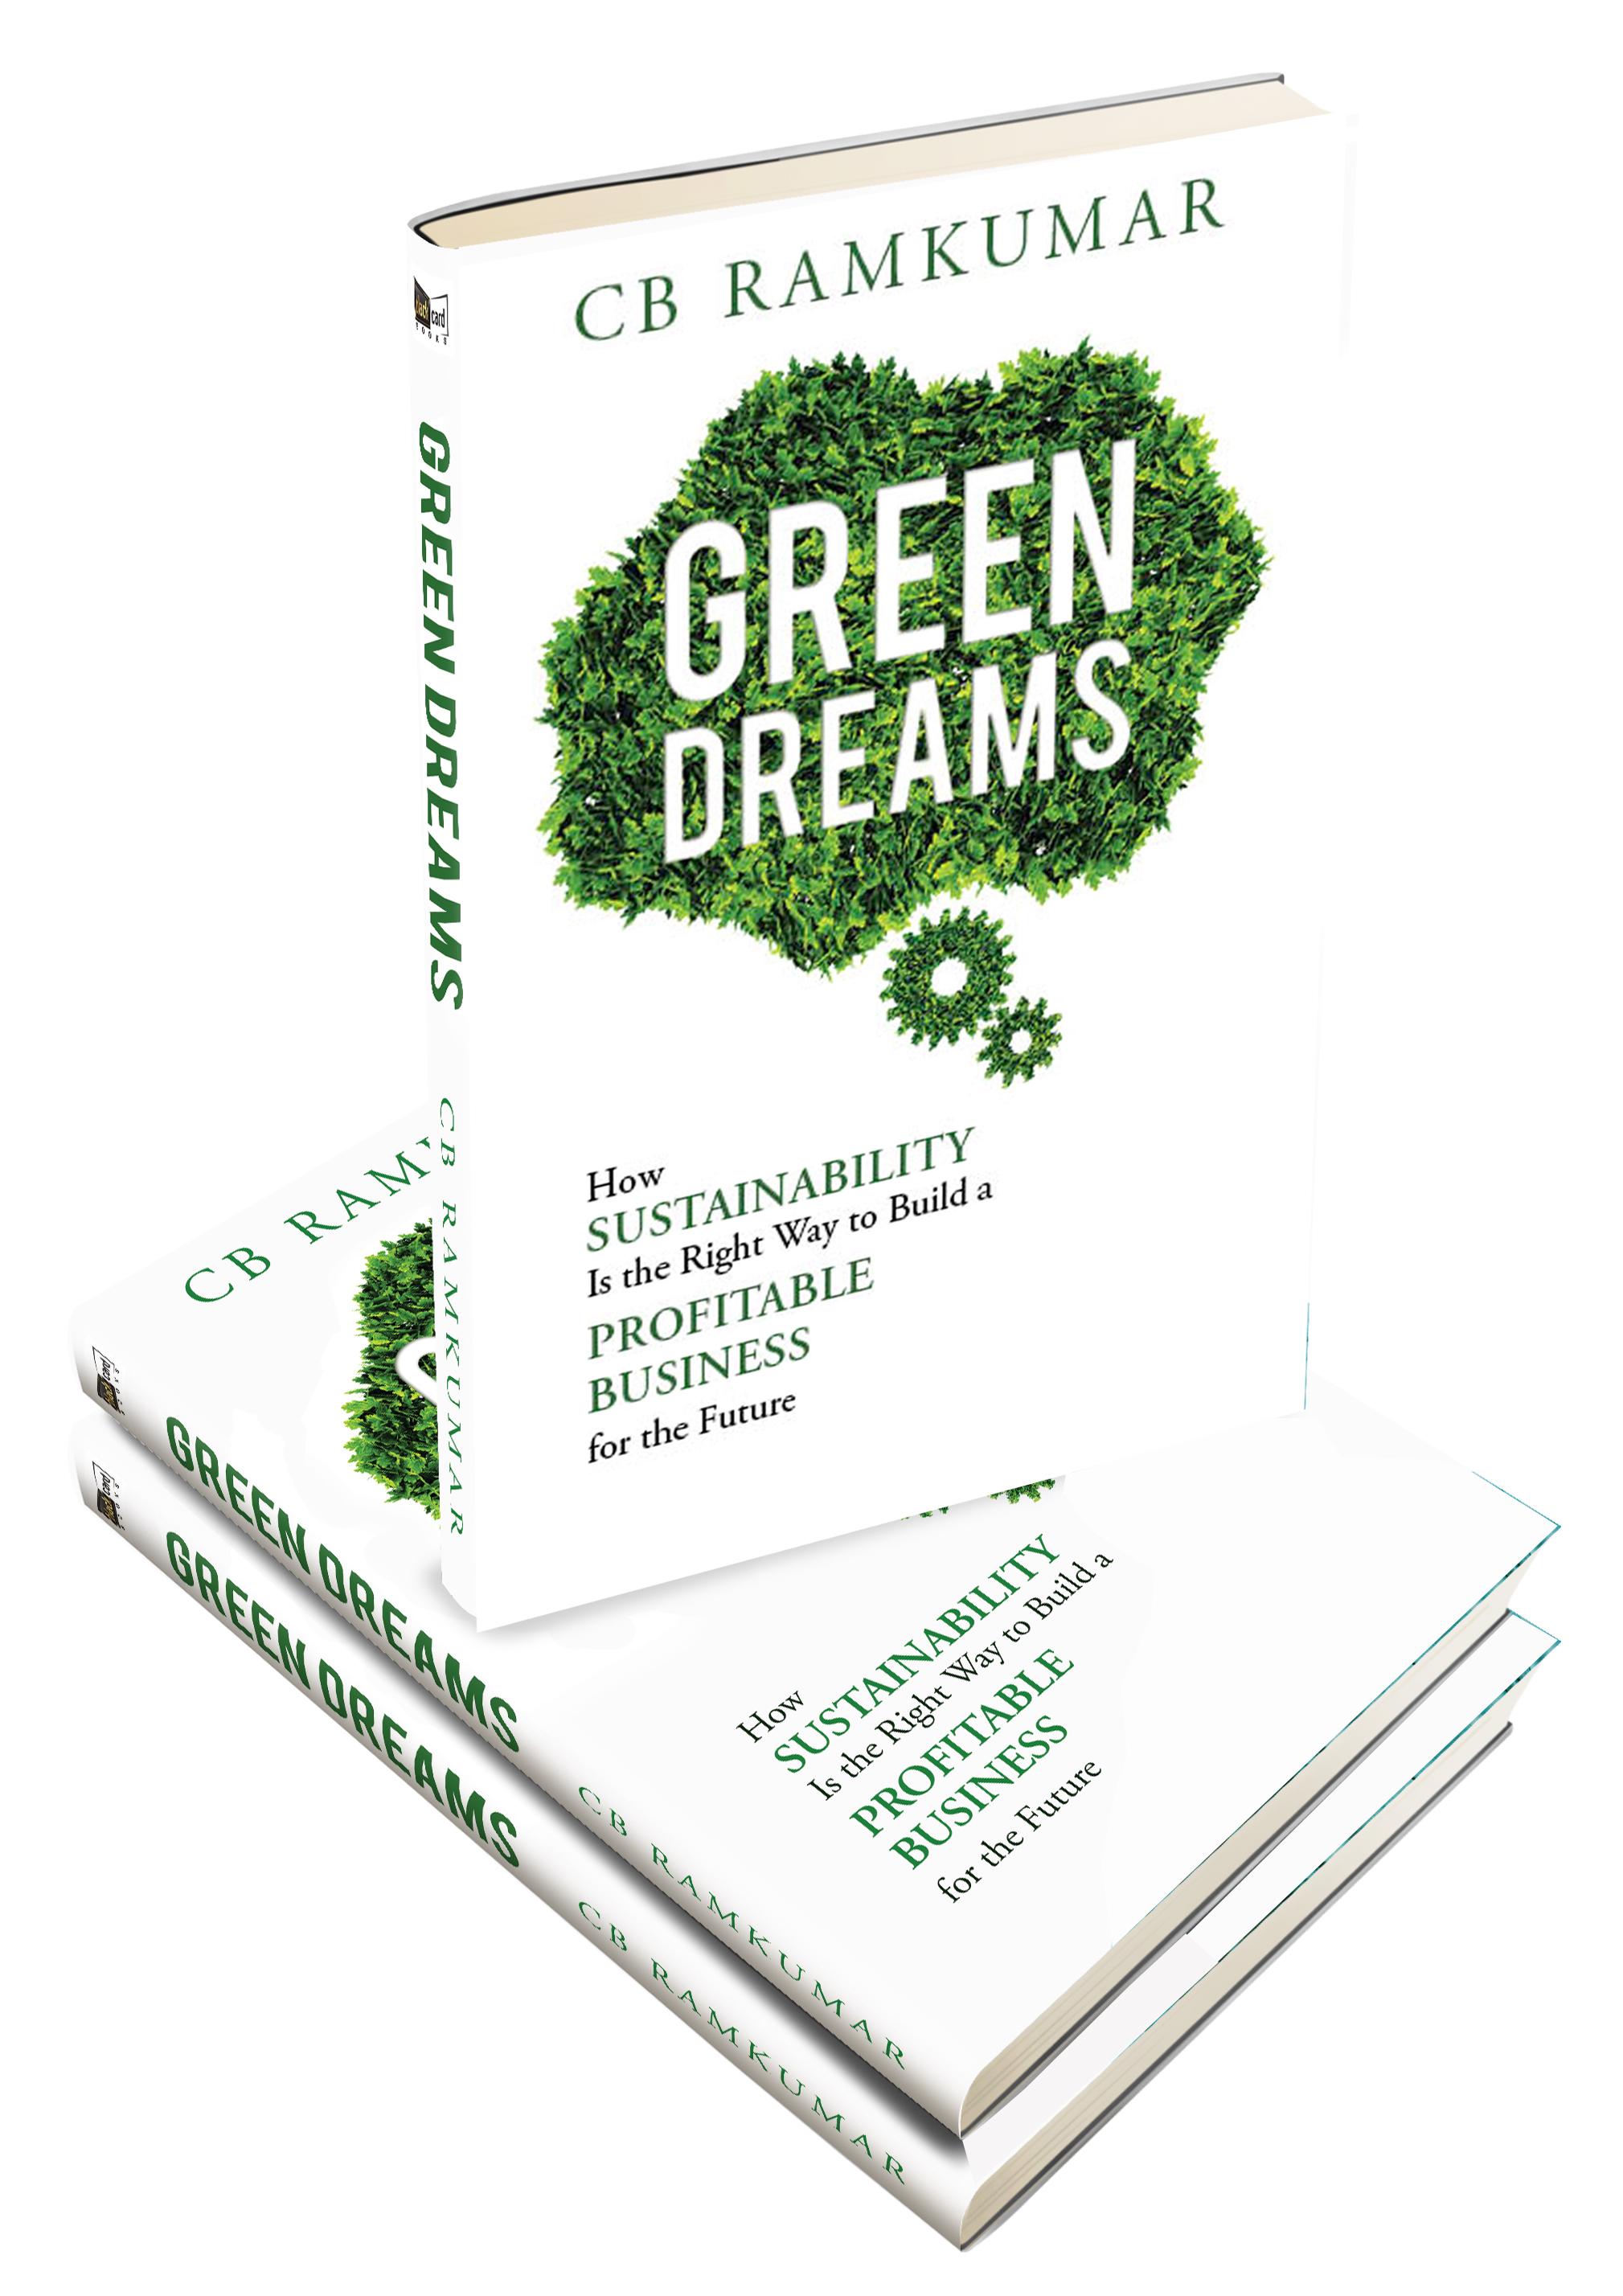 Green Dreams Book 3D_stack.jpg